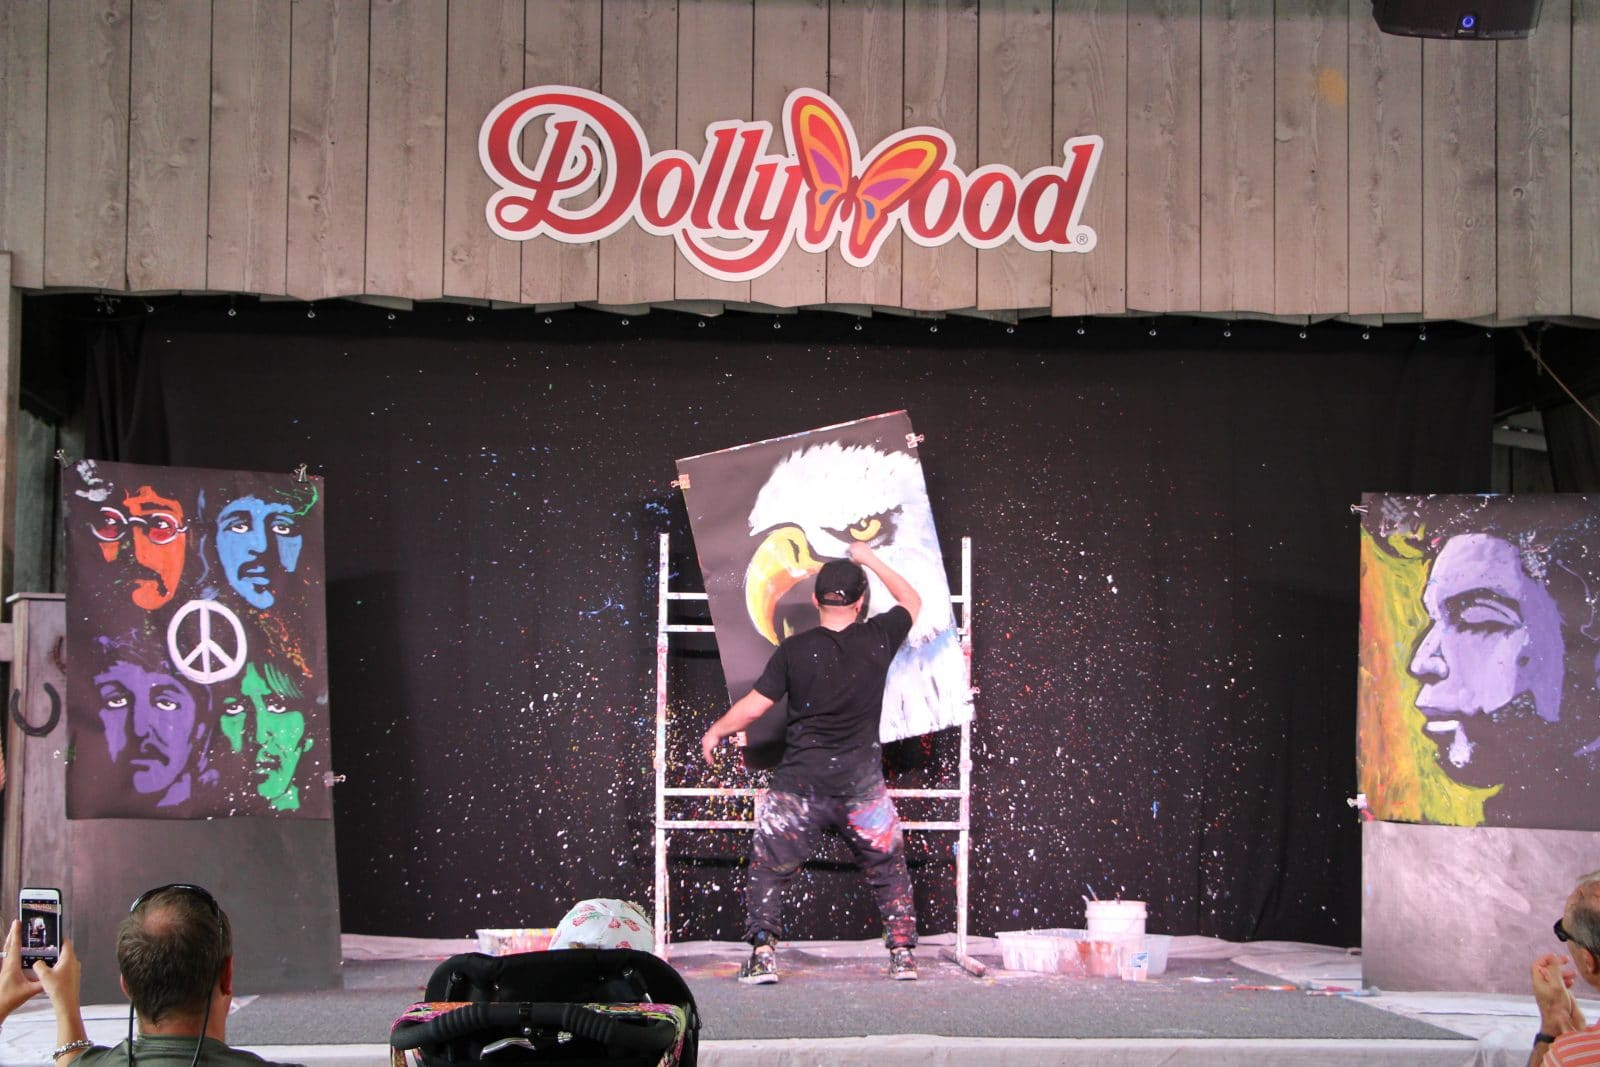 Dollywood Summer Celebration - Nightly Fireworks and